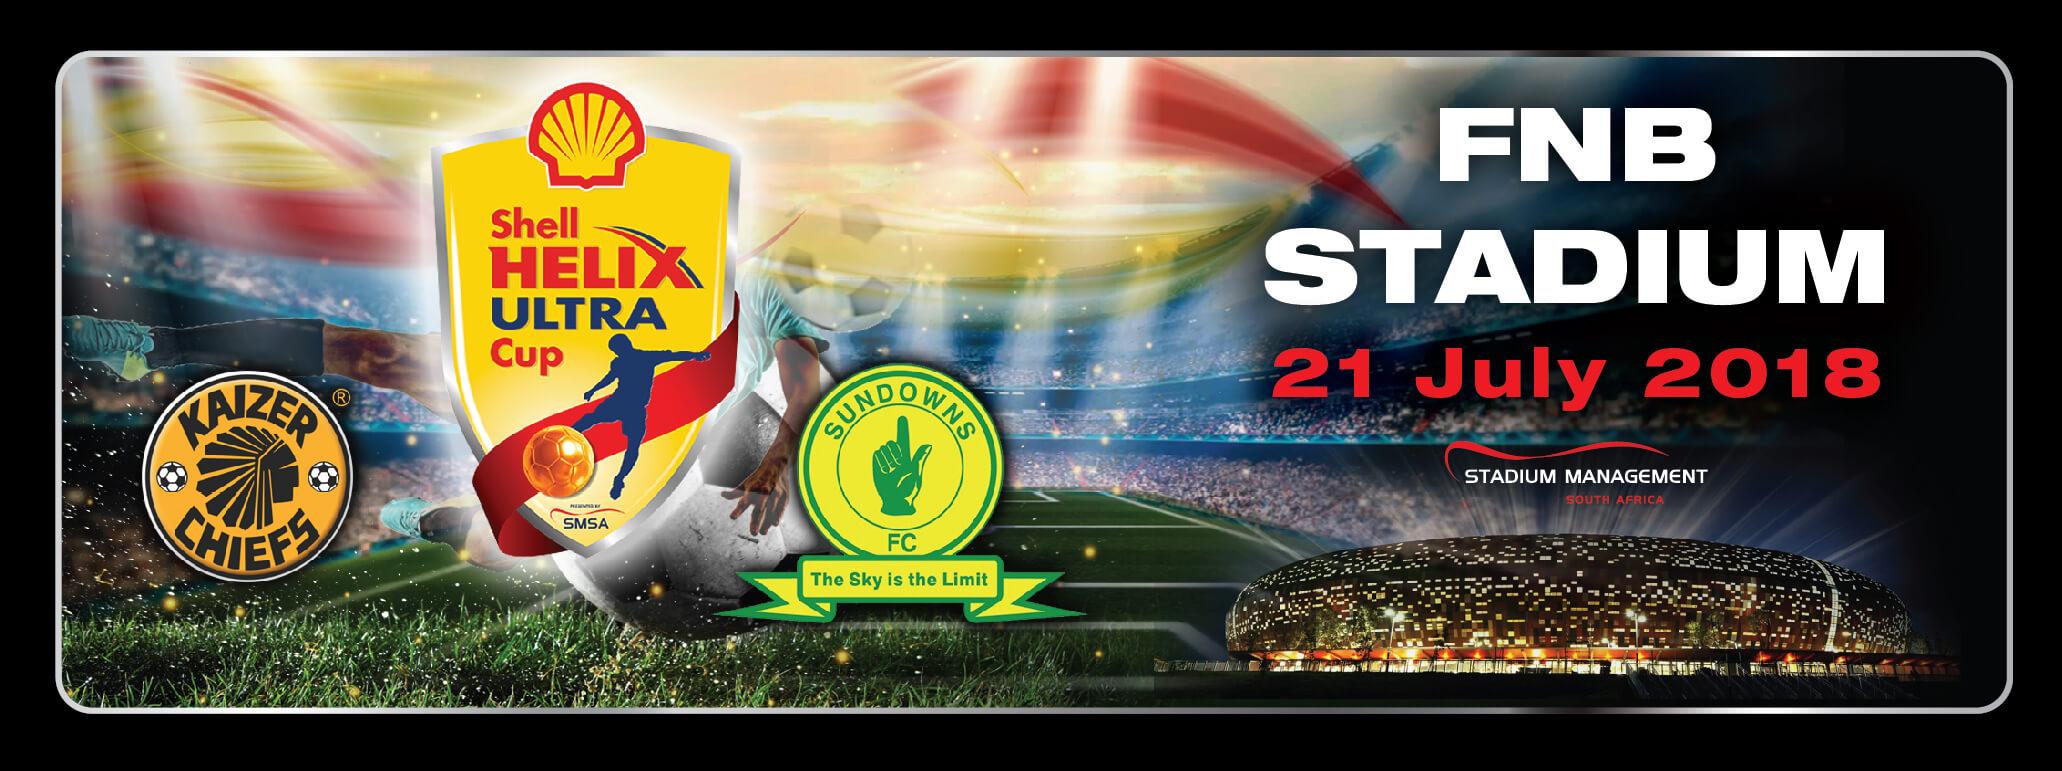 Kaizer Chiefs vs Mamelodi Sundows - Shell Helix Ultra Cup - Beluga Hospitality Banner